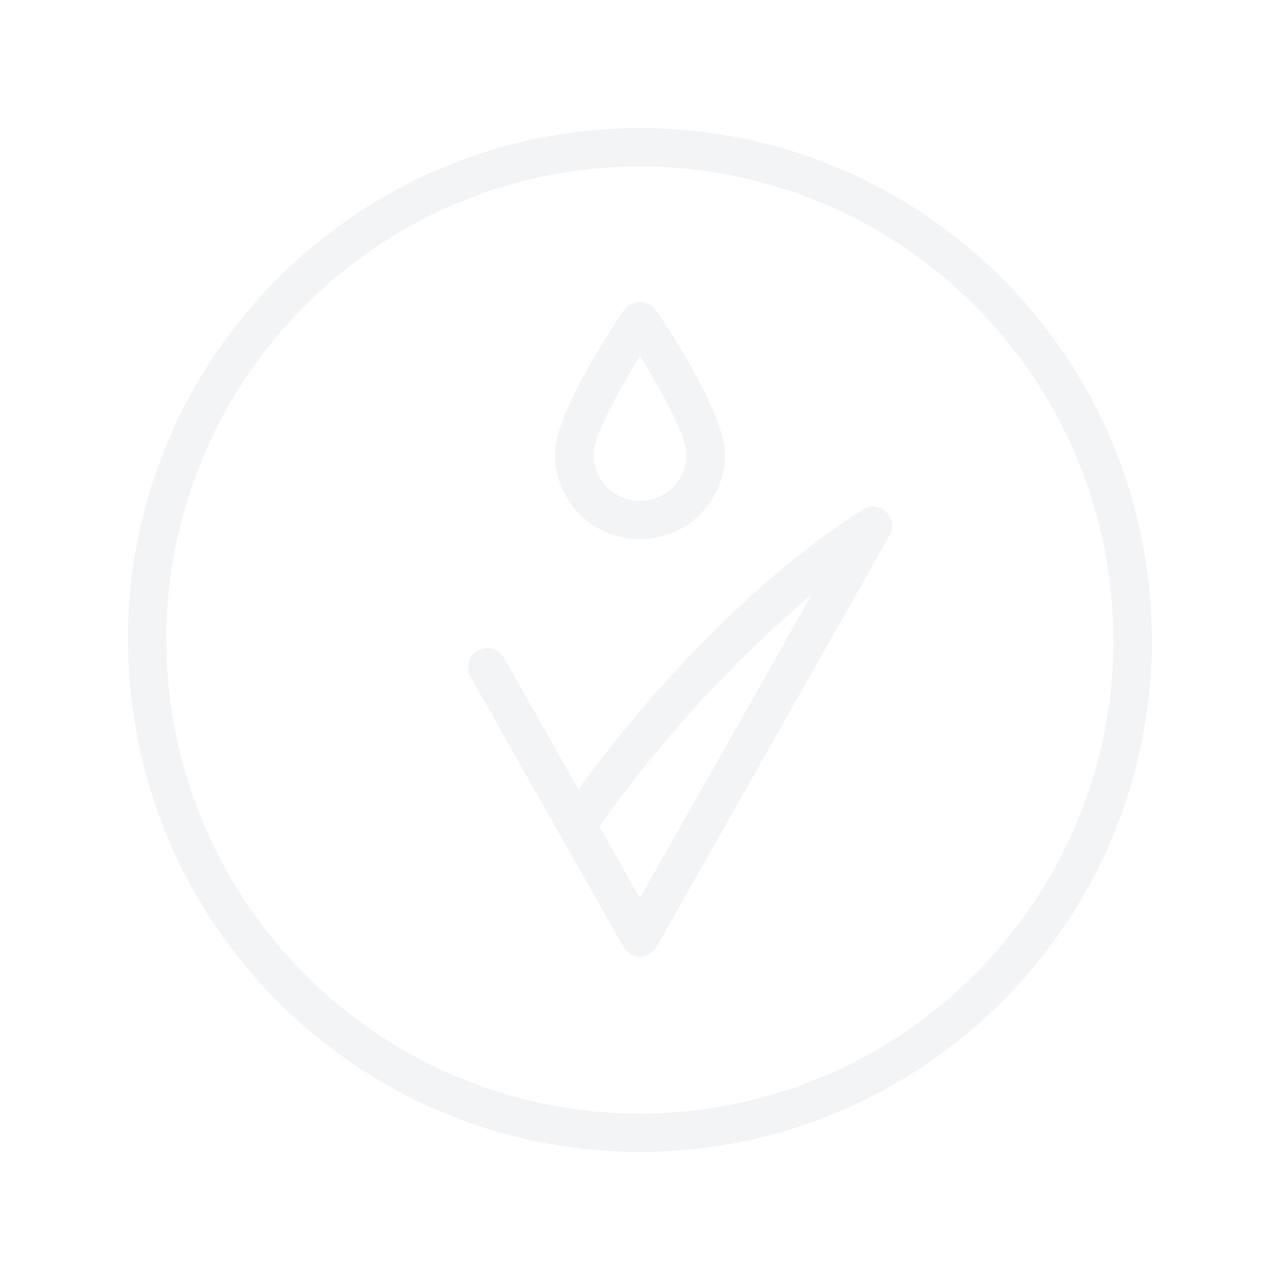 Eylure Naturals Lashes No.020